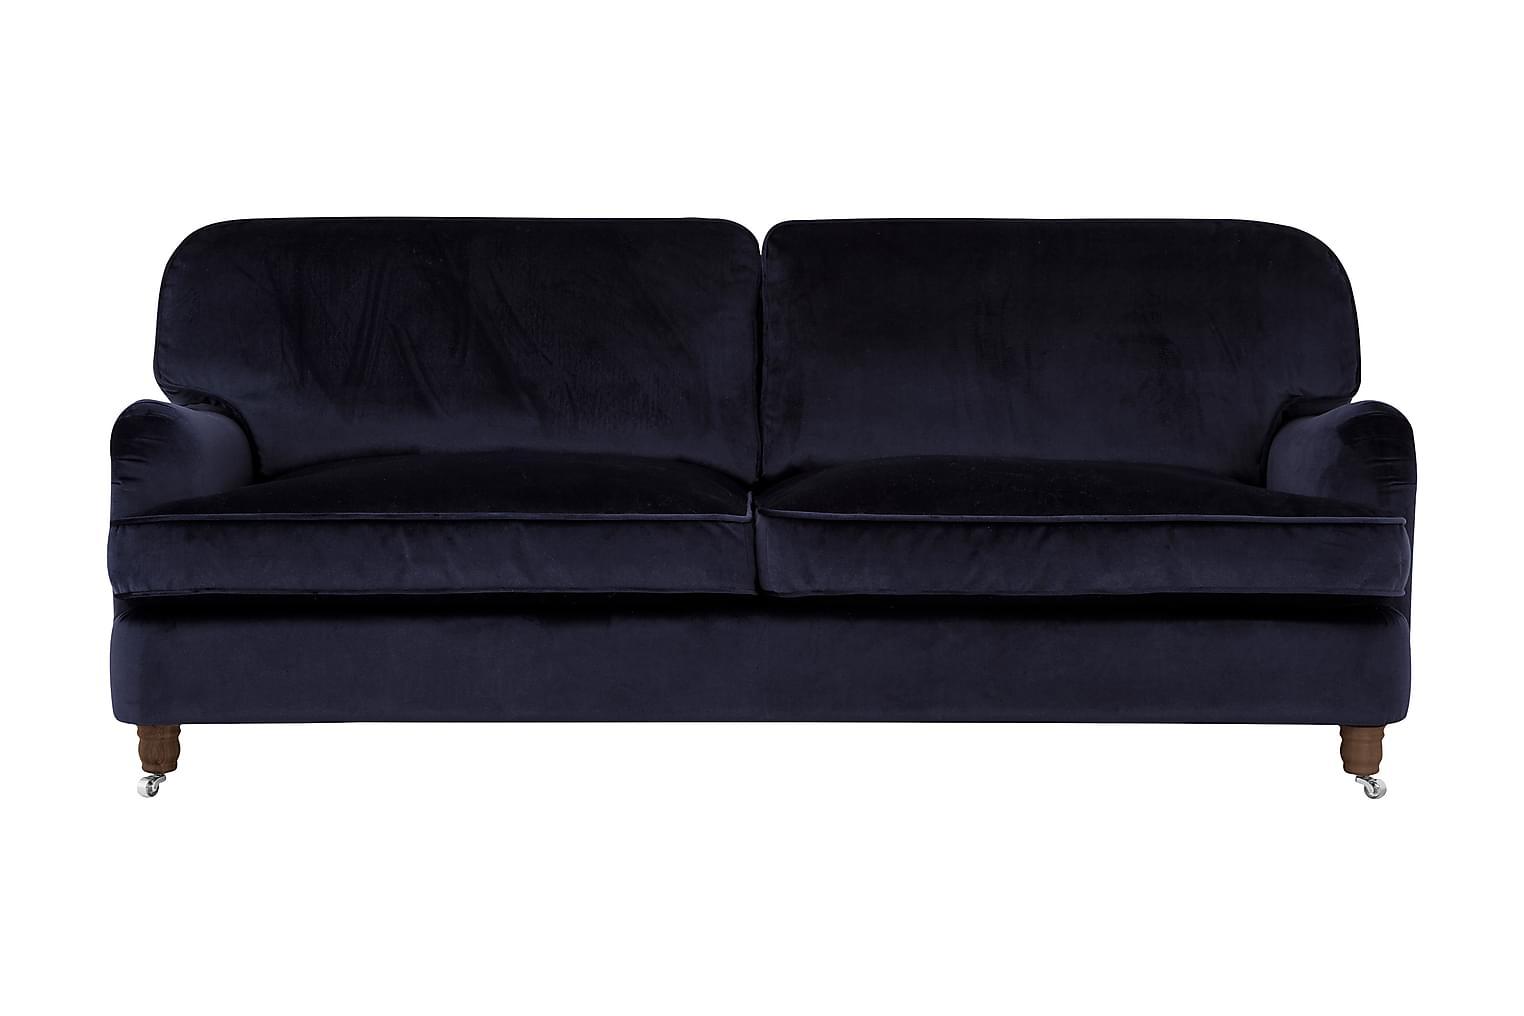 Howard-Deluxe HOWARD-DELUXE 3-sits Soffa Sammet Mörkblå -